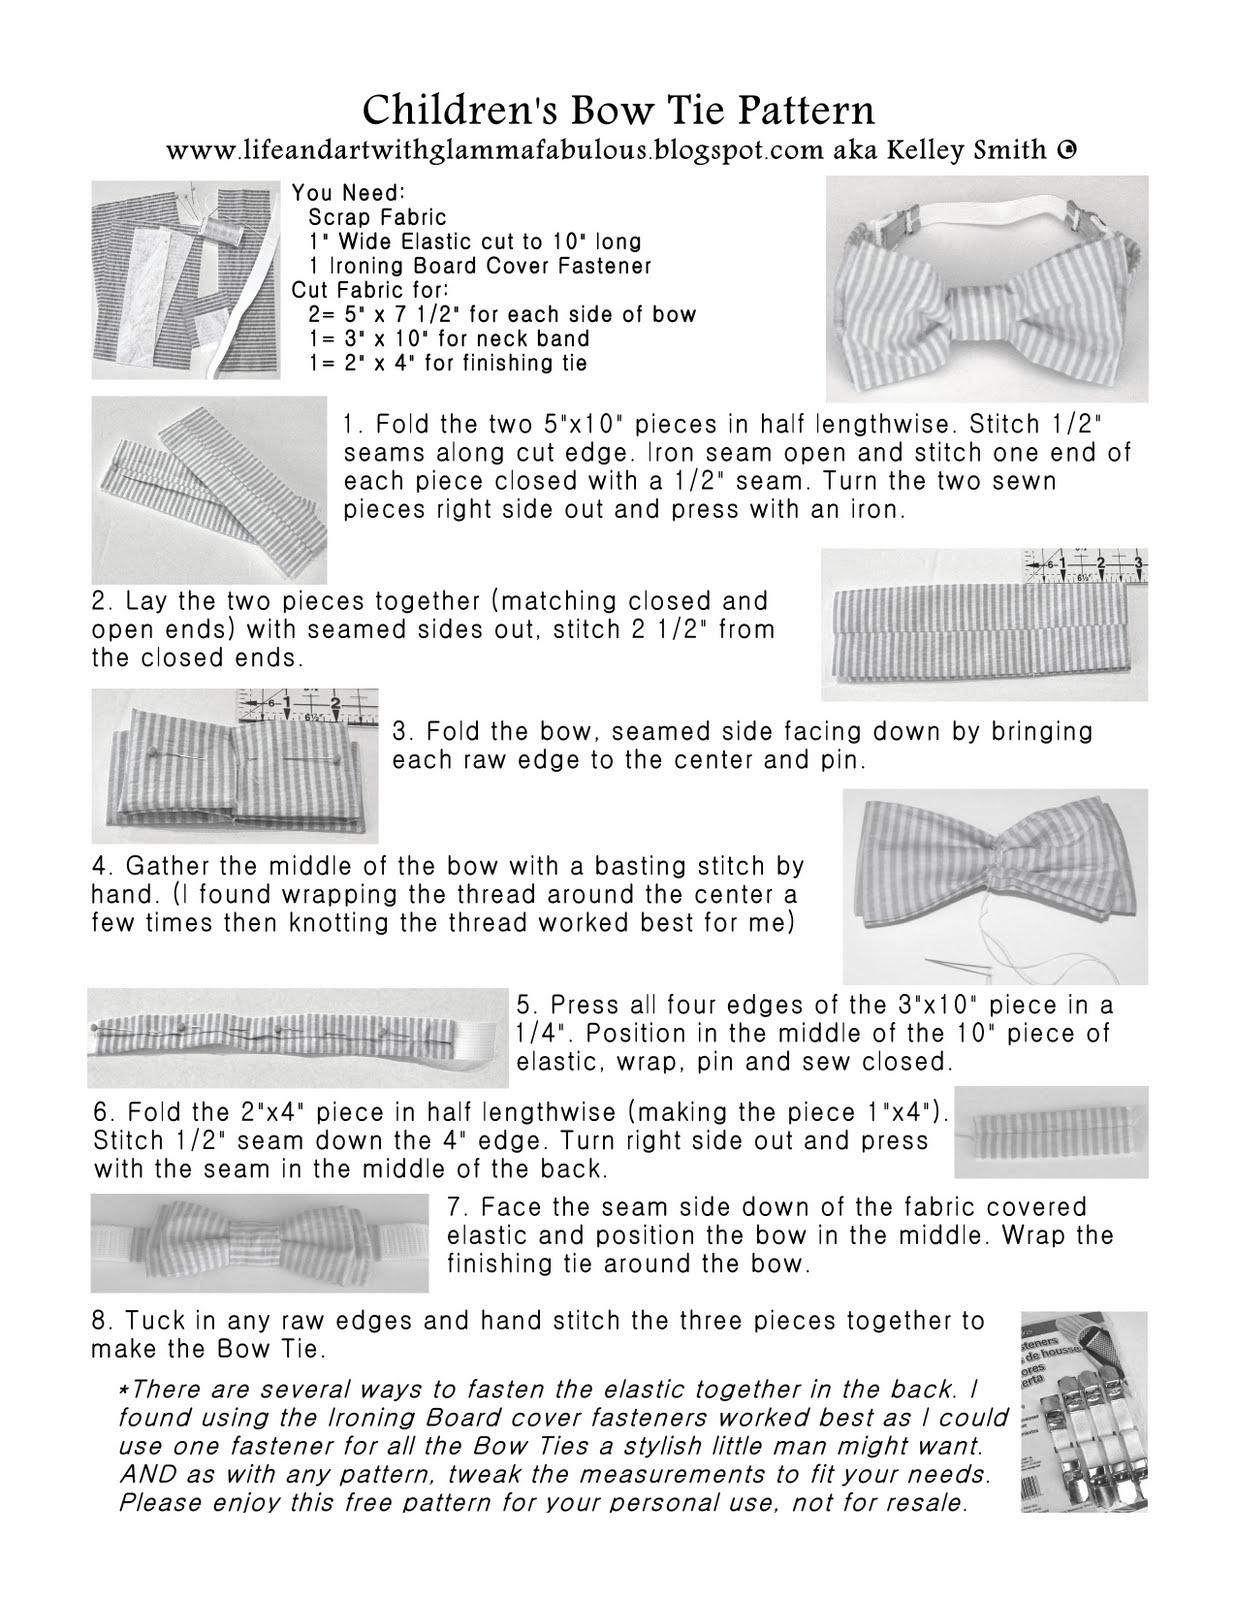 Childrens bow tie pattern google image result for http2bp childrens bow tie pattern google image result for http2bpspotq7yf1bbsolss8eknd9ea8iaaaaaaaacfuzebkmwp66rss1600children27s2b jeuxipadfo Images